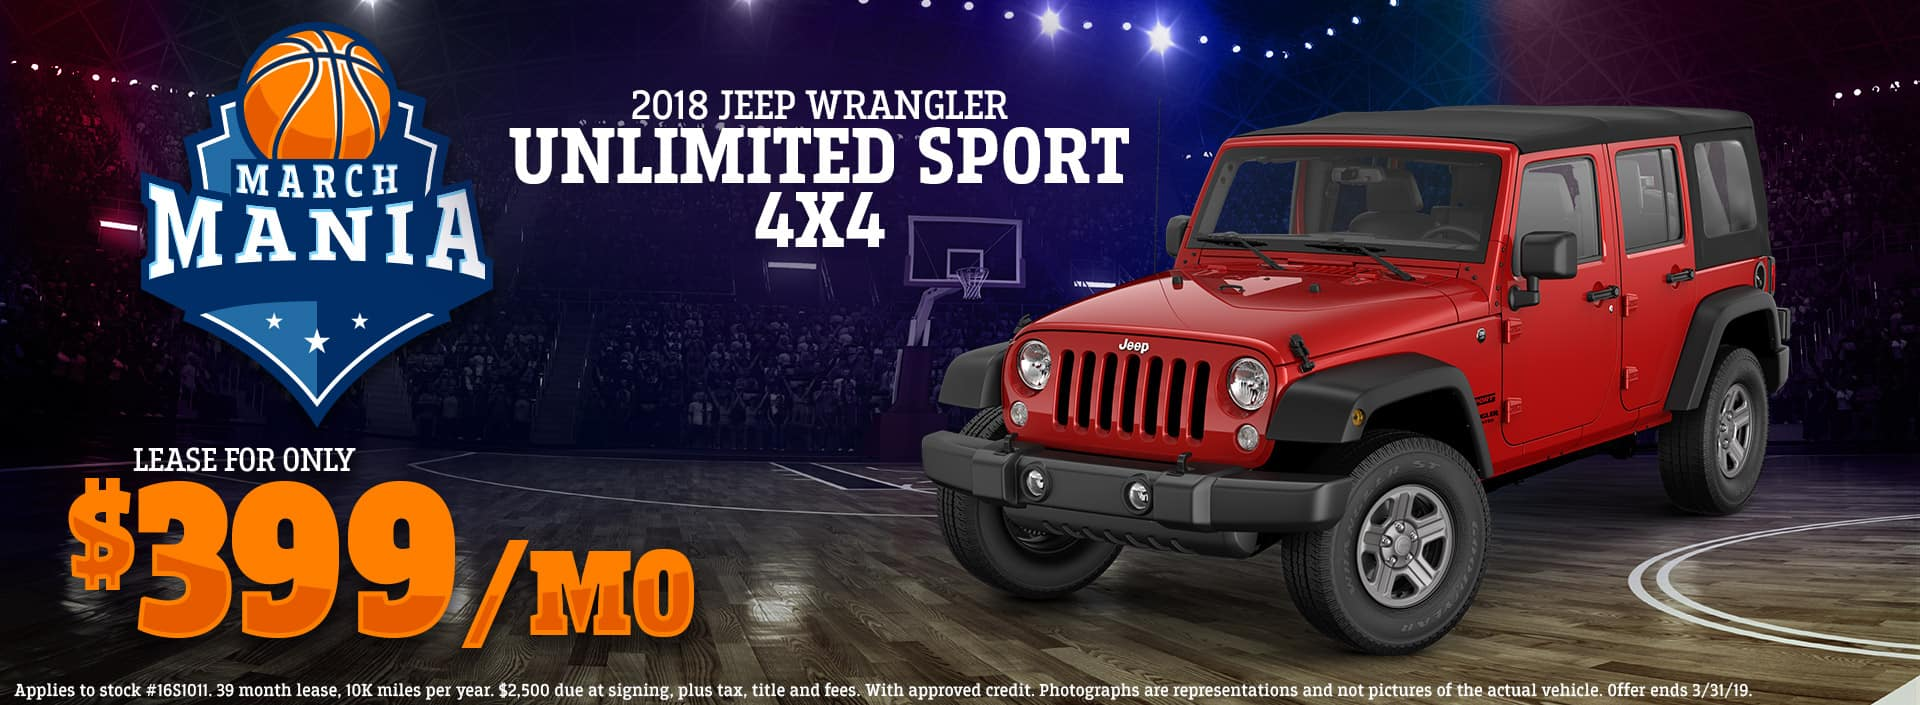 3.19 - 2018 Jeep Wrangler Unlimited Sport 4x4